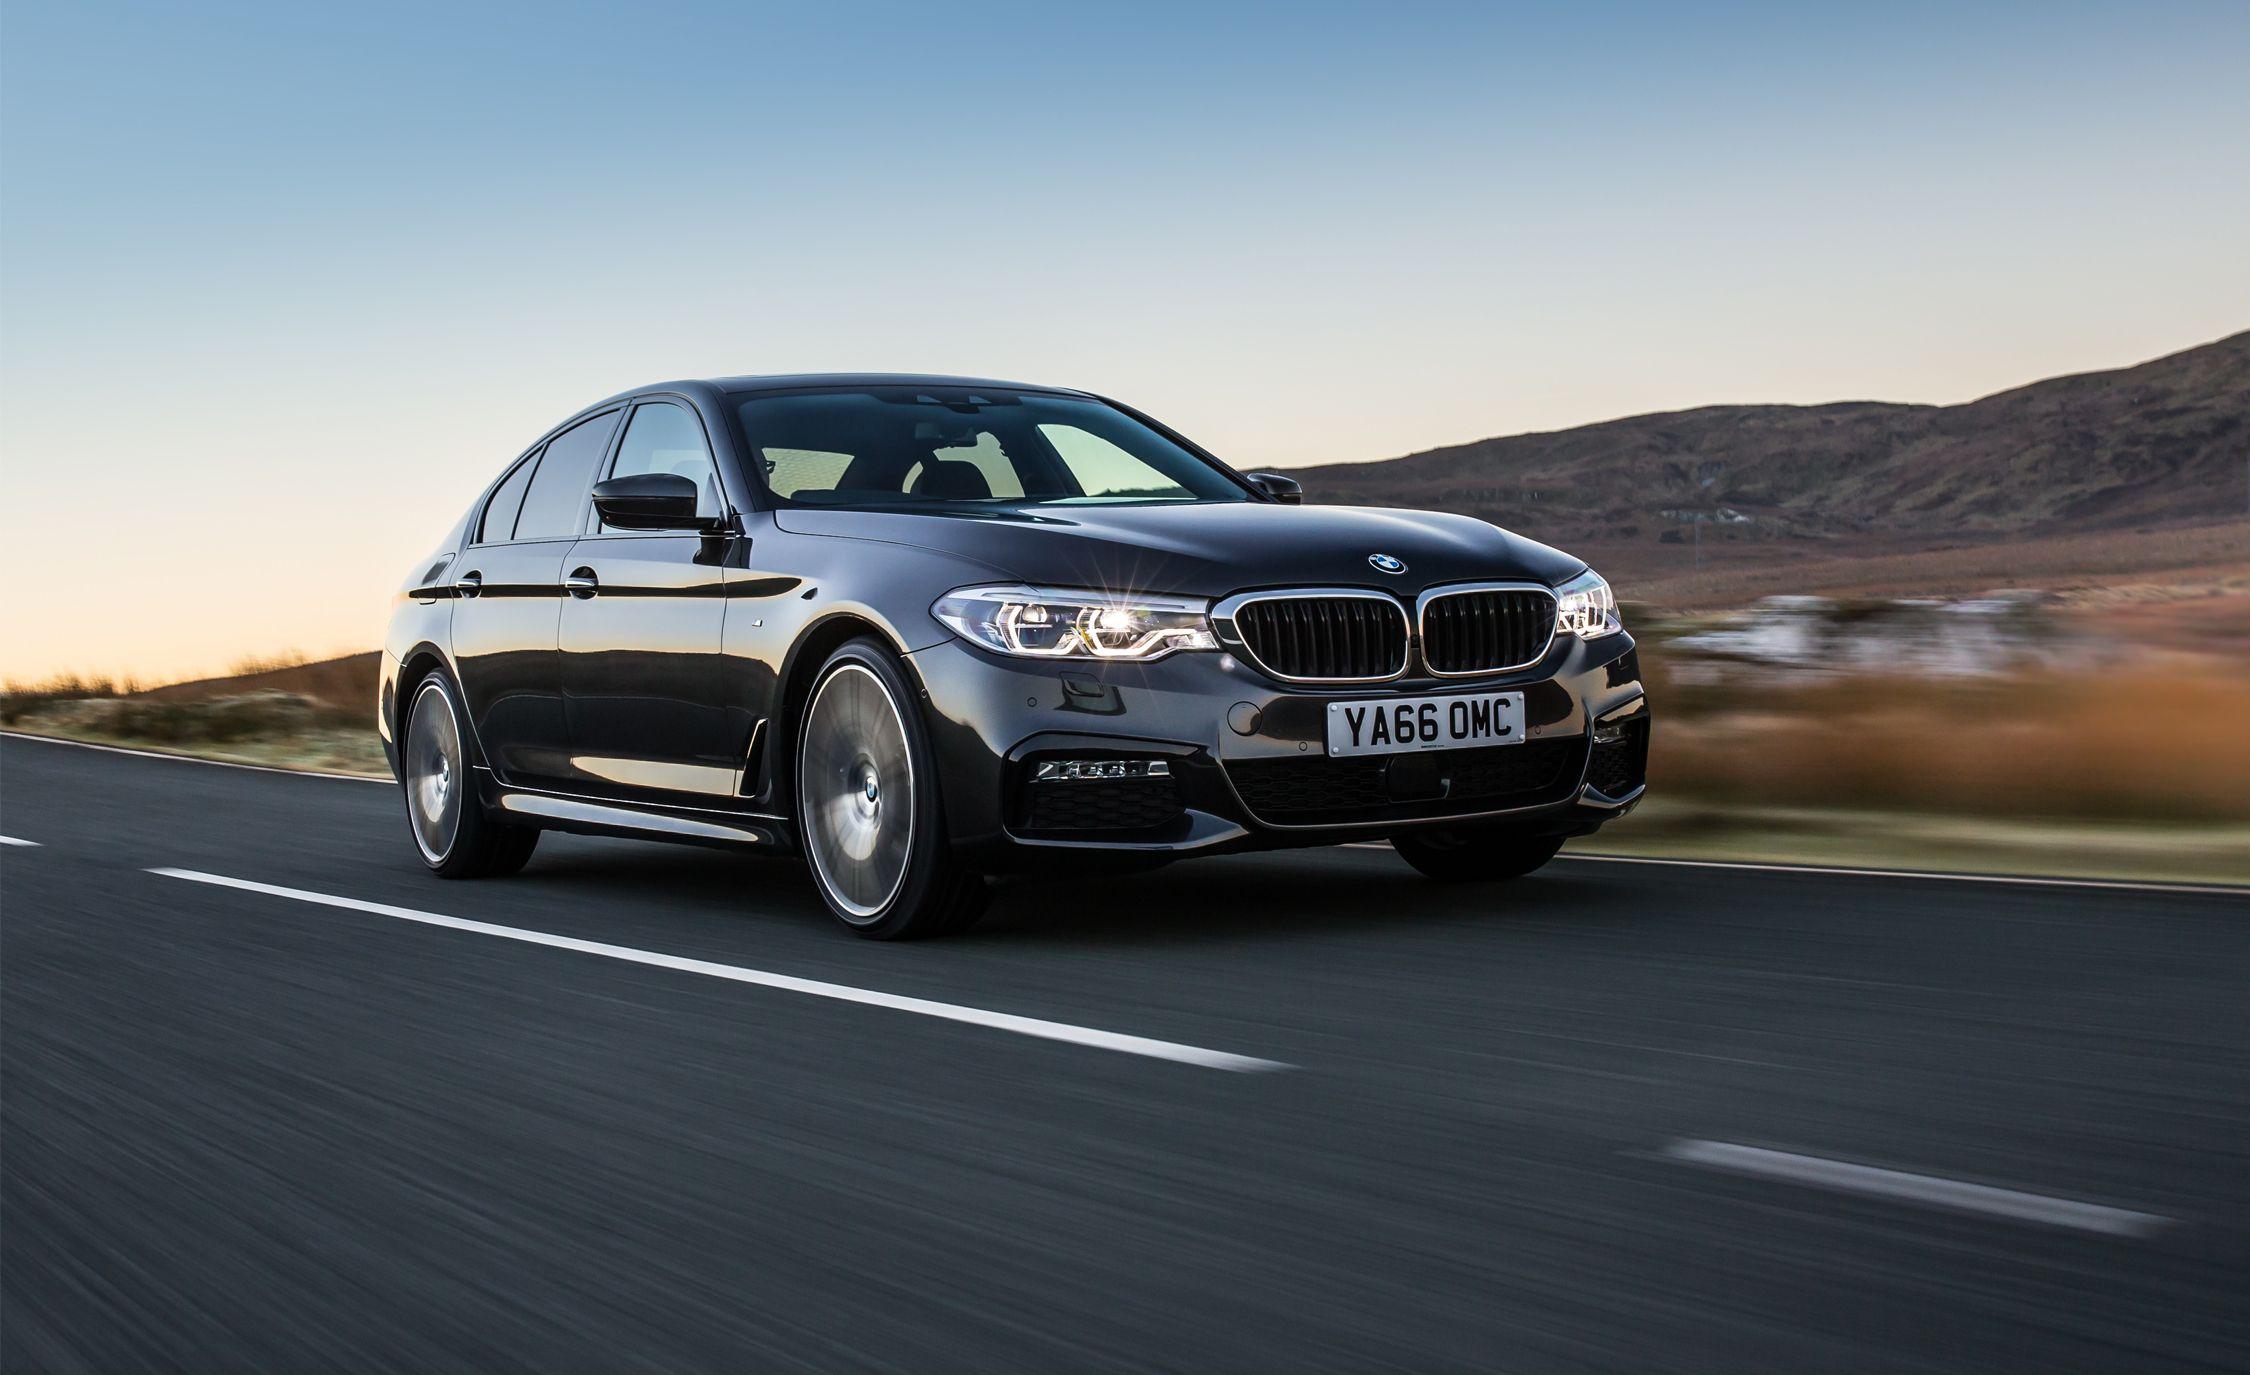 2017 Bmw 530d Euro Spec